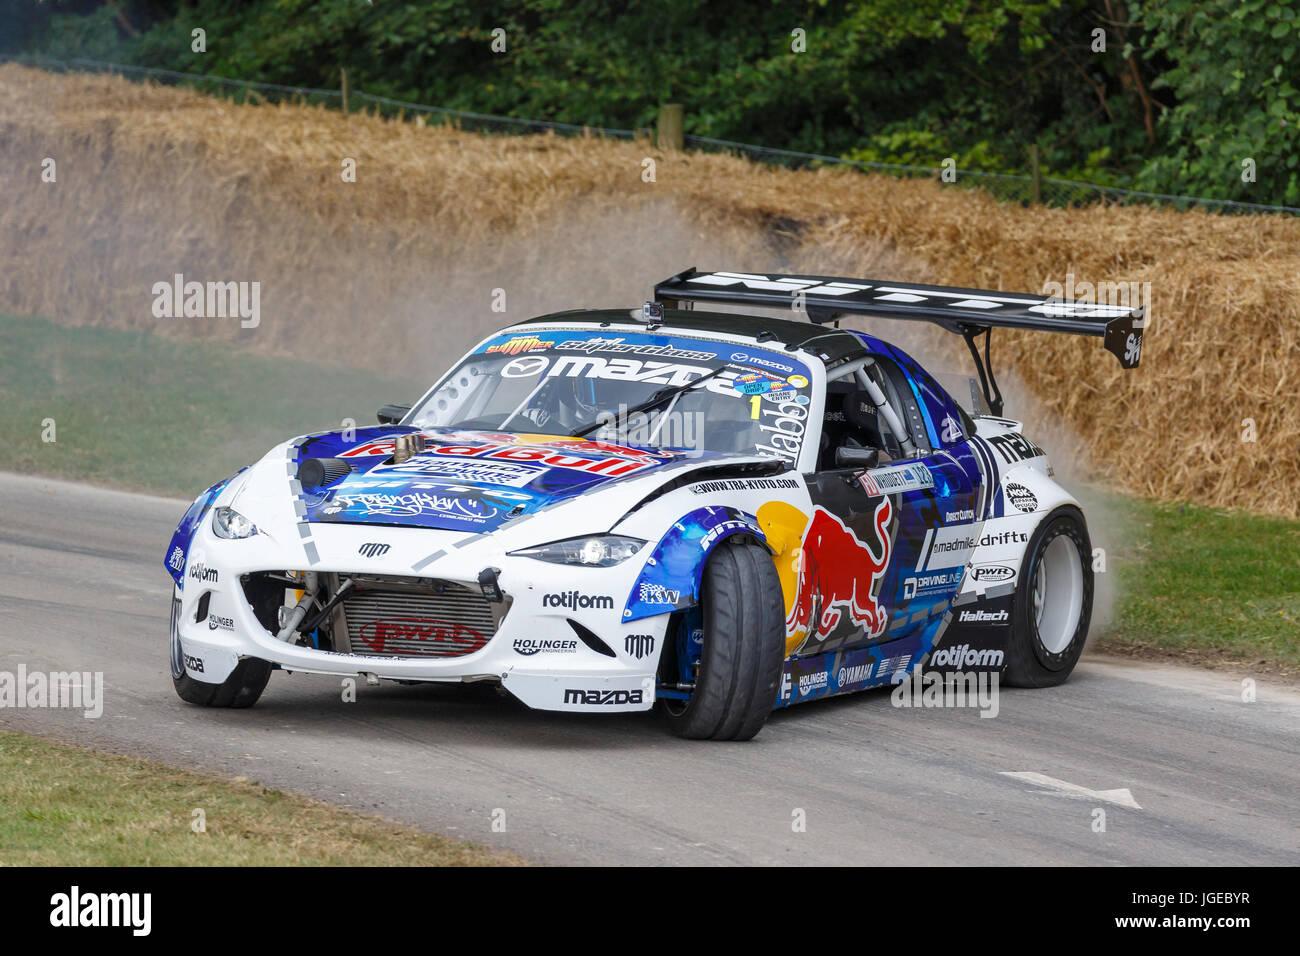 2016 Radbul Mazda Mx 5 Drift Car With Driver Mad Mike Whiddett